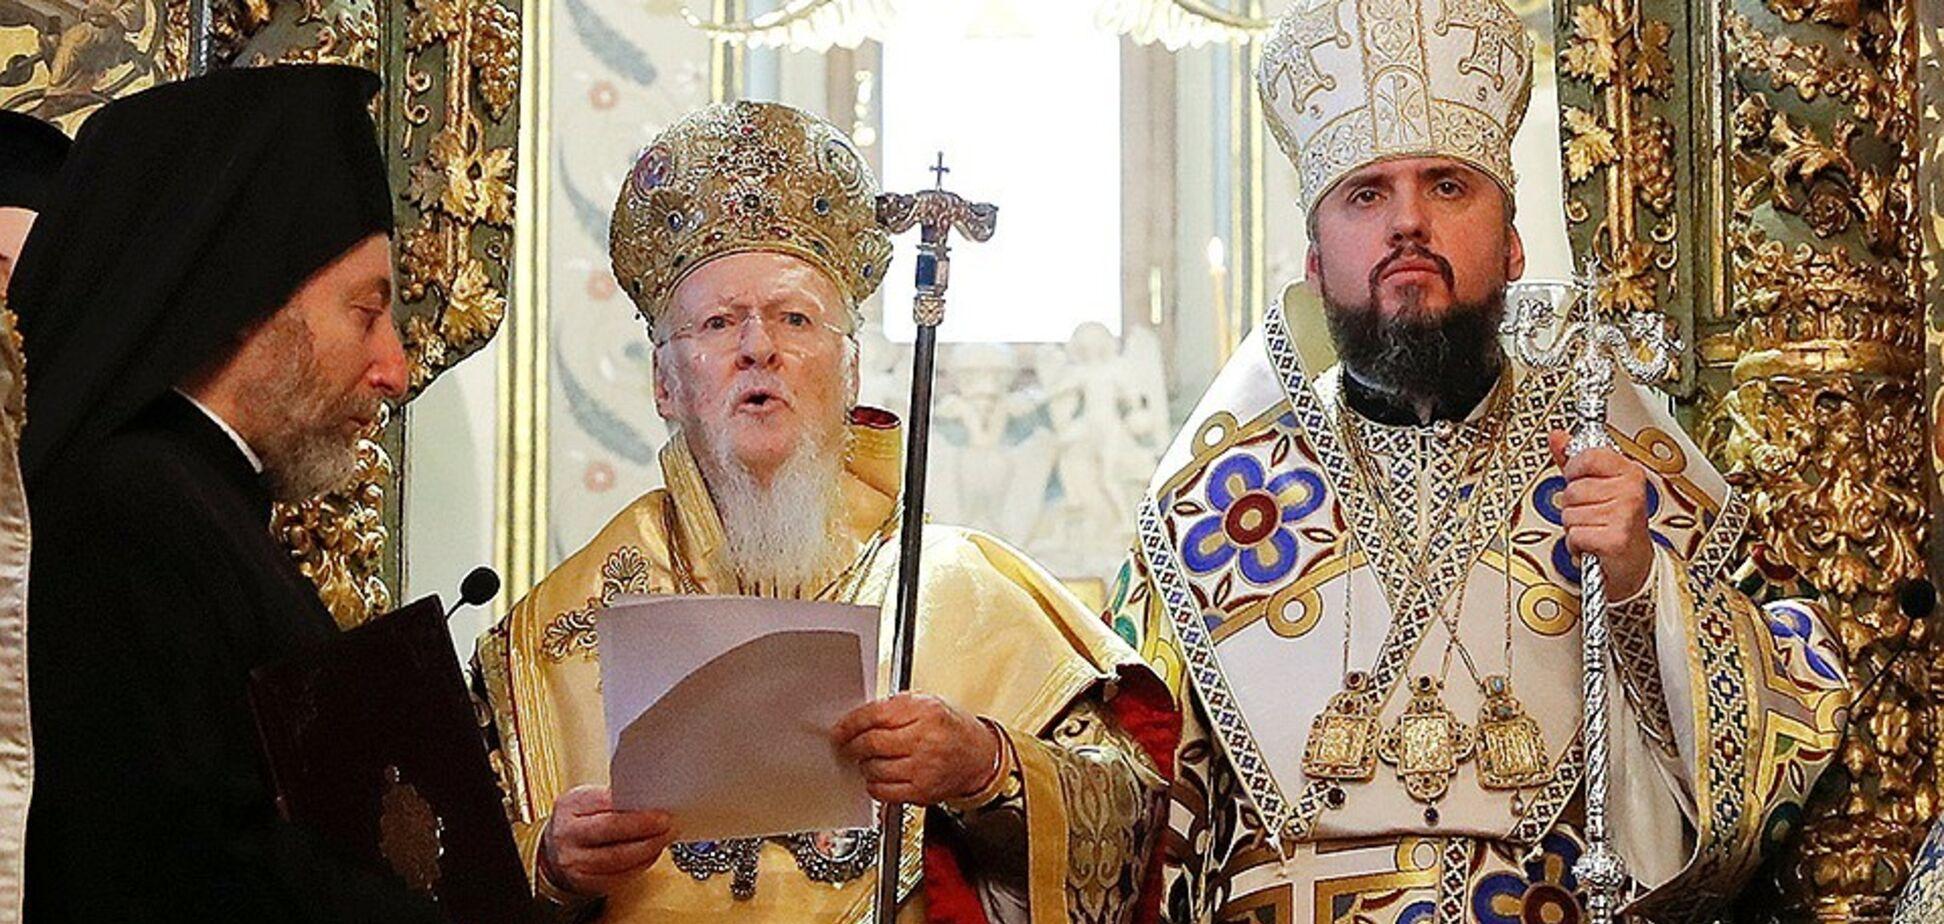 'Судить Варфоломея': в РПЦ нацелились на престол в Константинополе